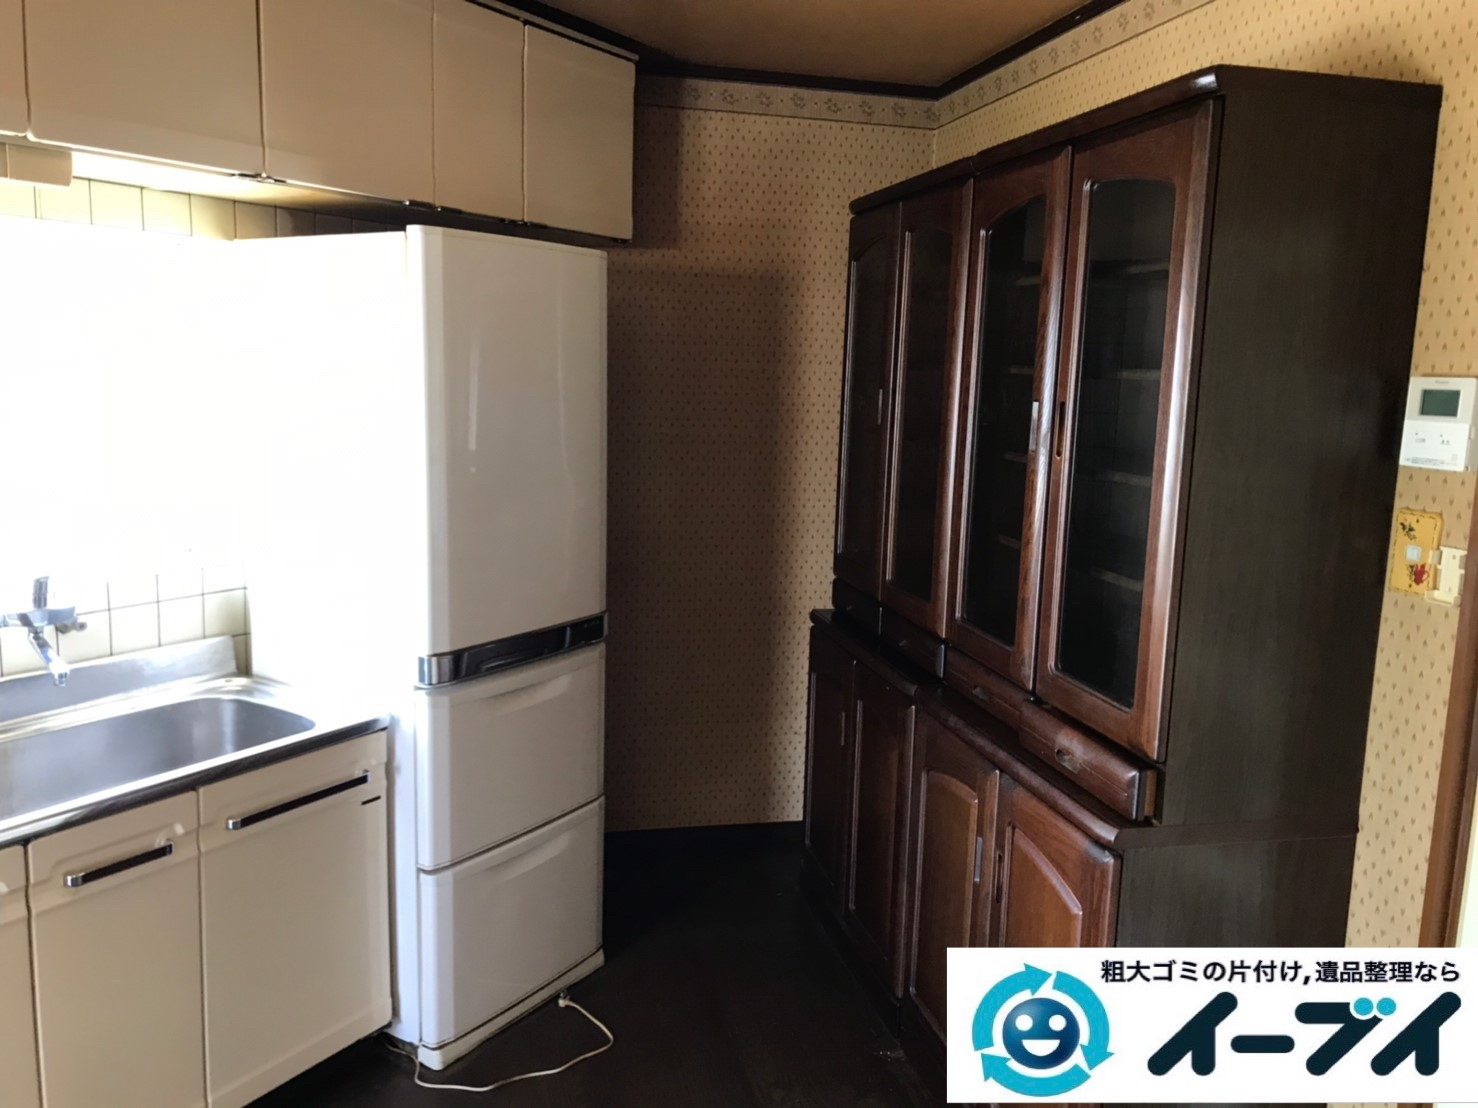 2019年10月30日大阪府摂津市で食器棚の大型家具、冷蔵庫の大型家電処分。写真1